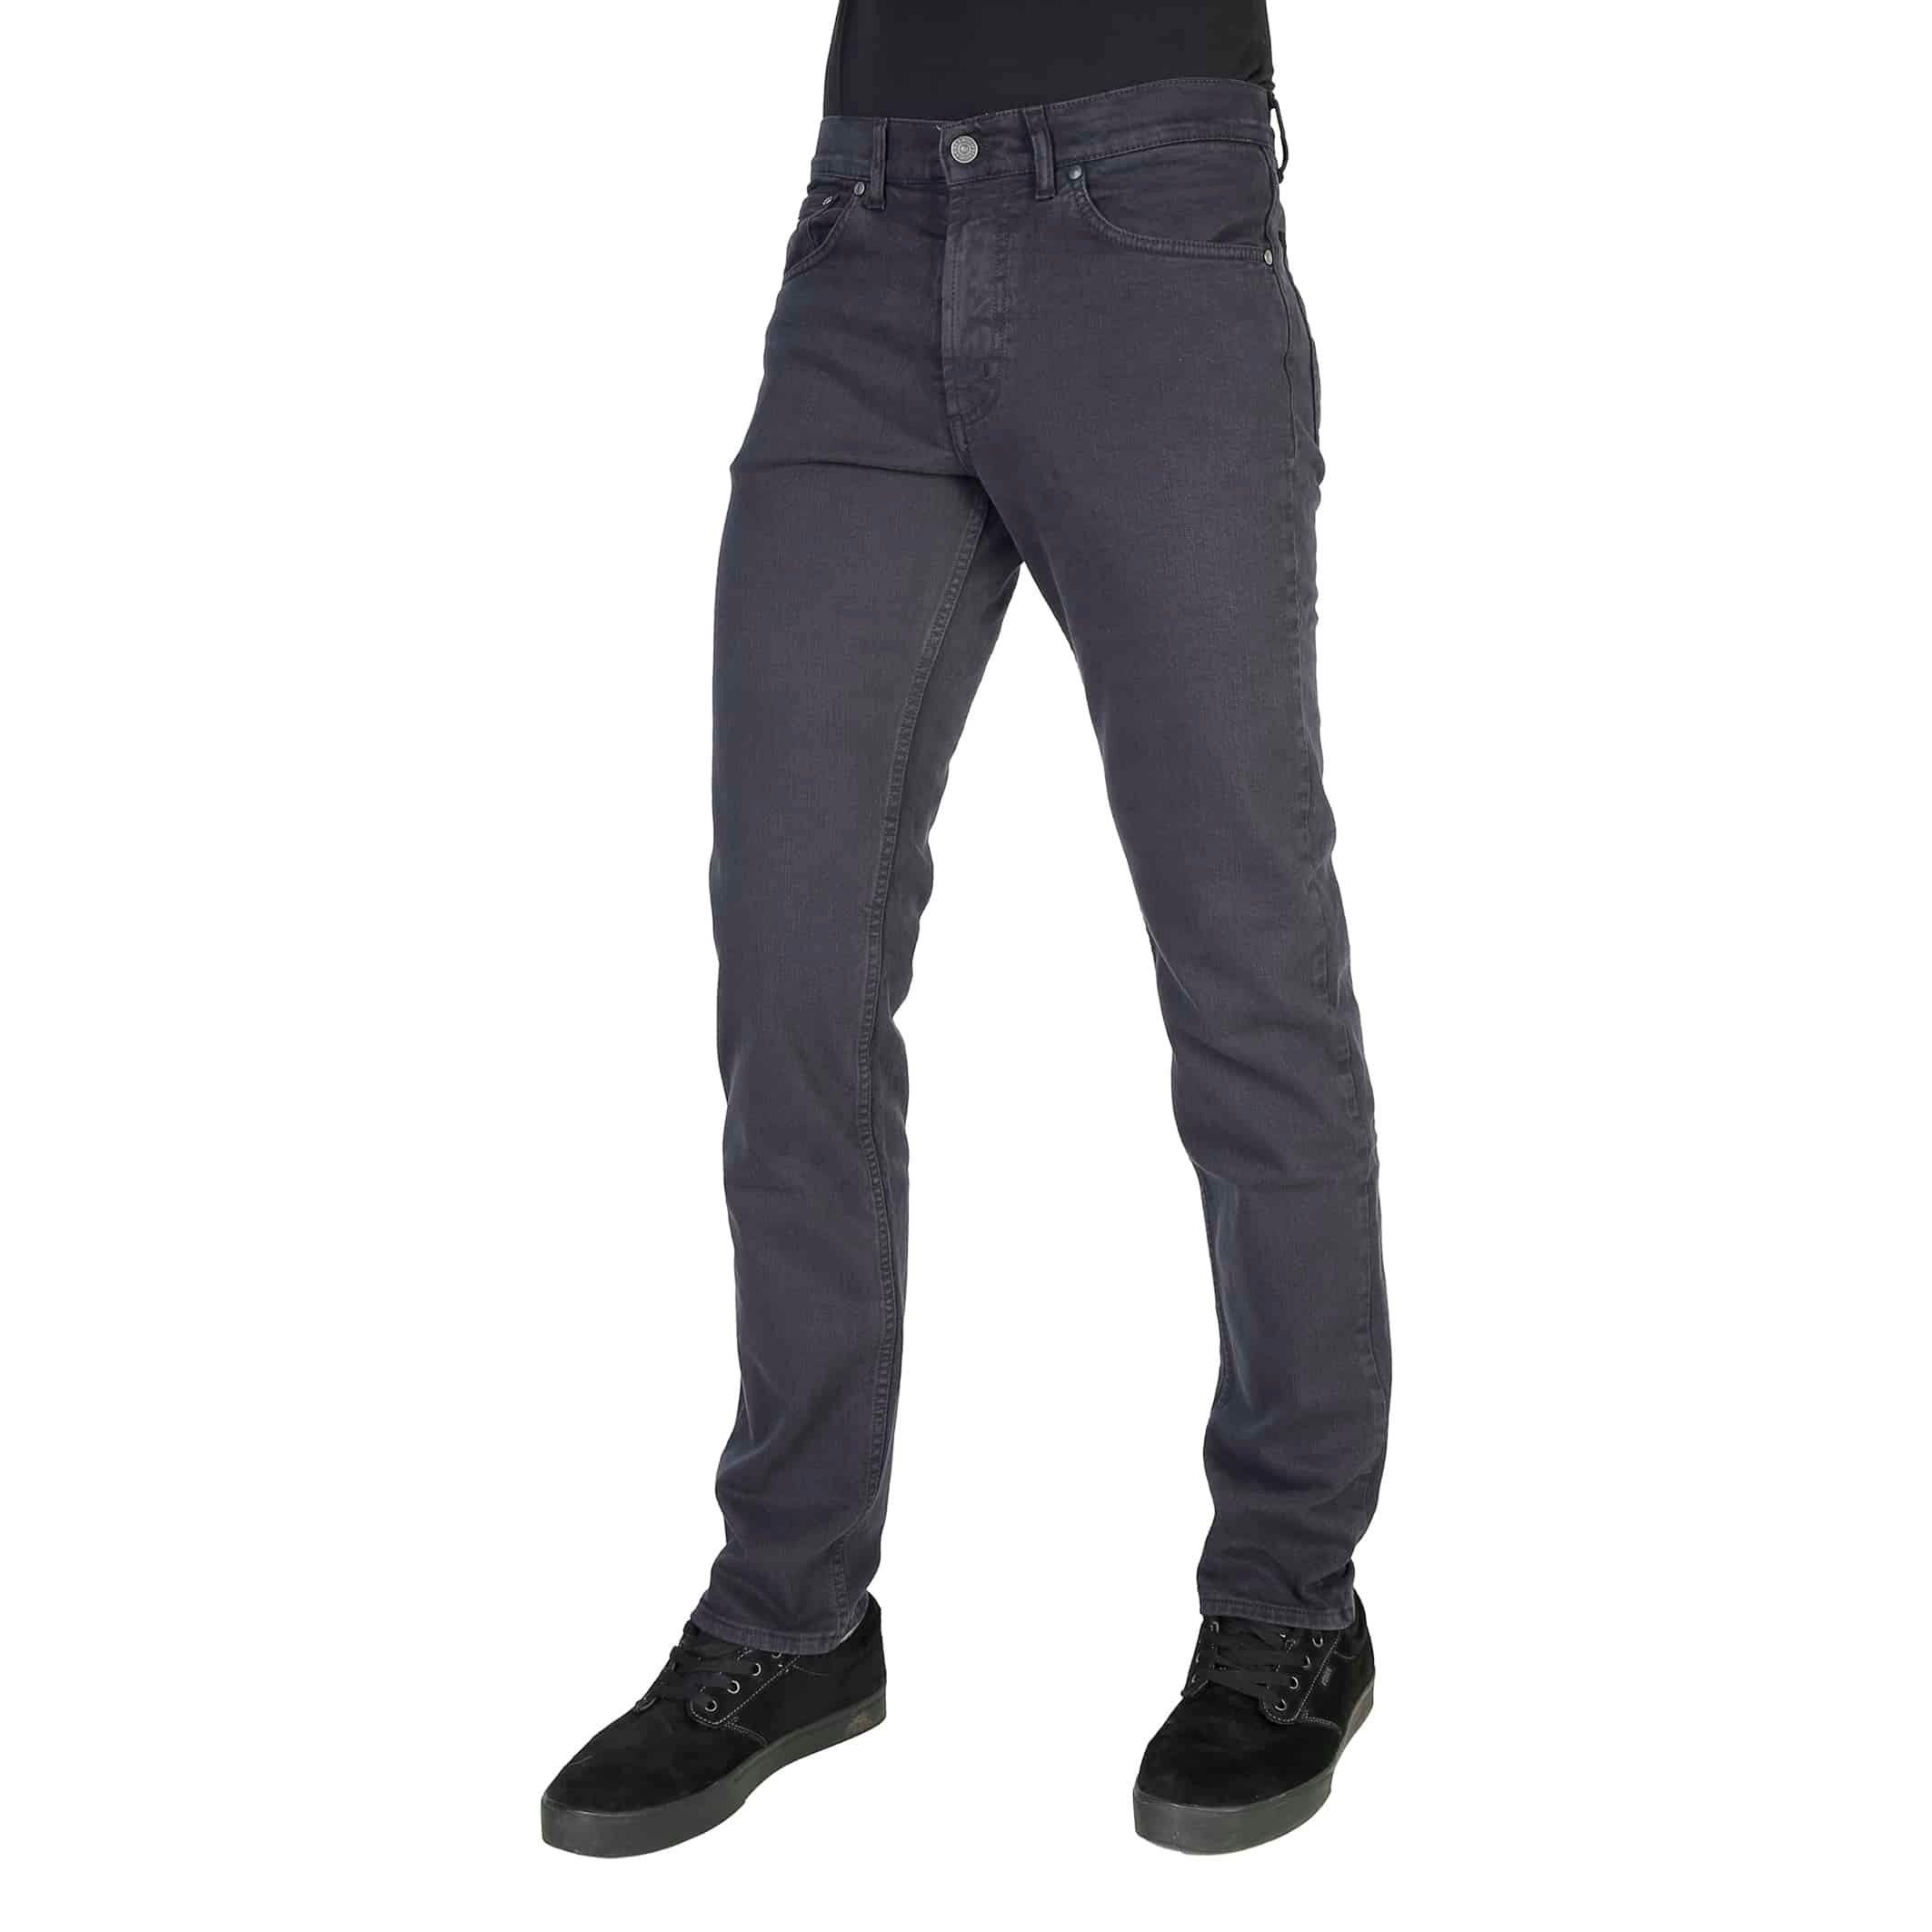 Carrera Jeans – 000700_9302A